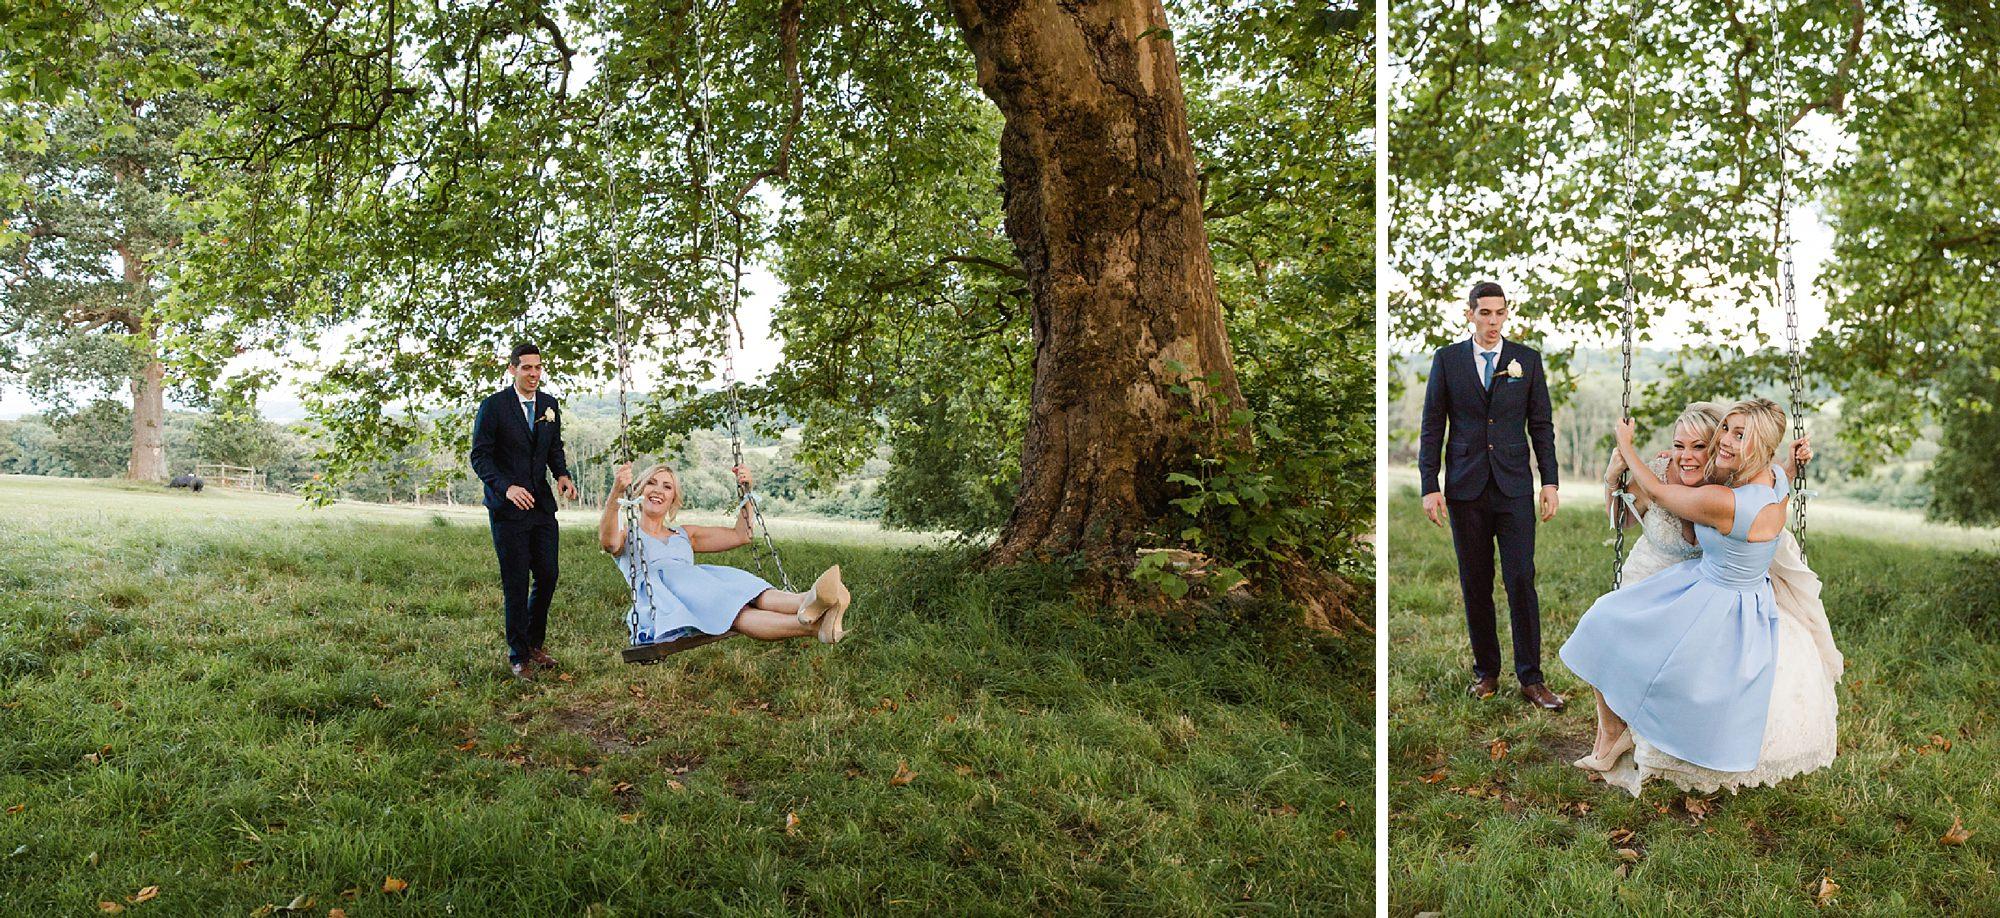 Bignor Park wedding photography bridesmaid on swing